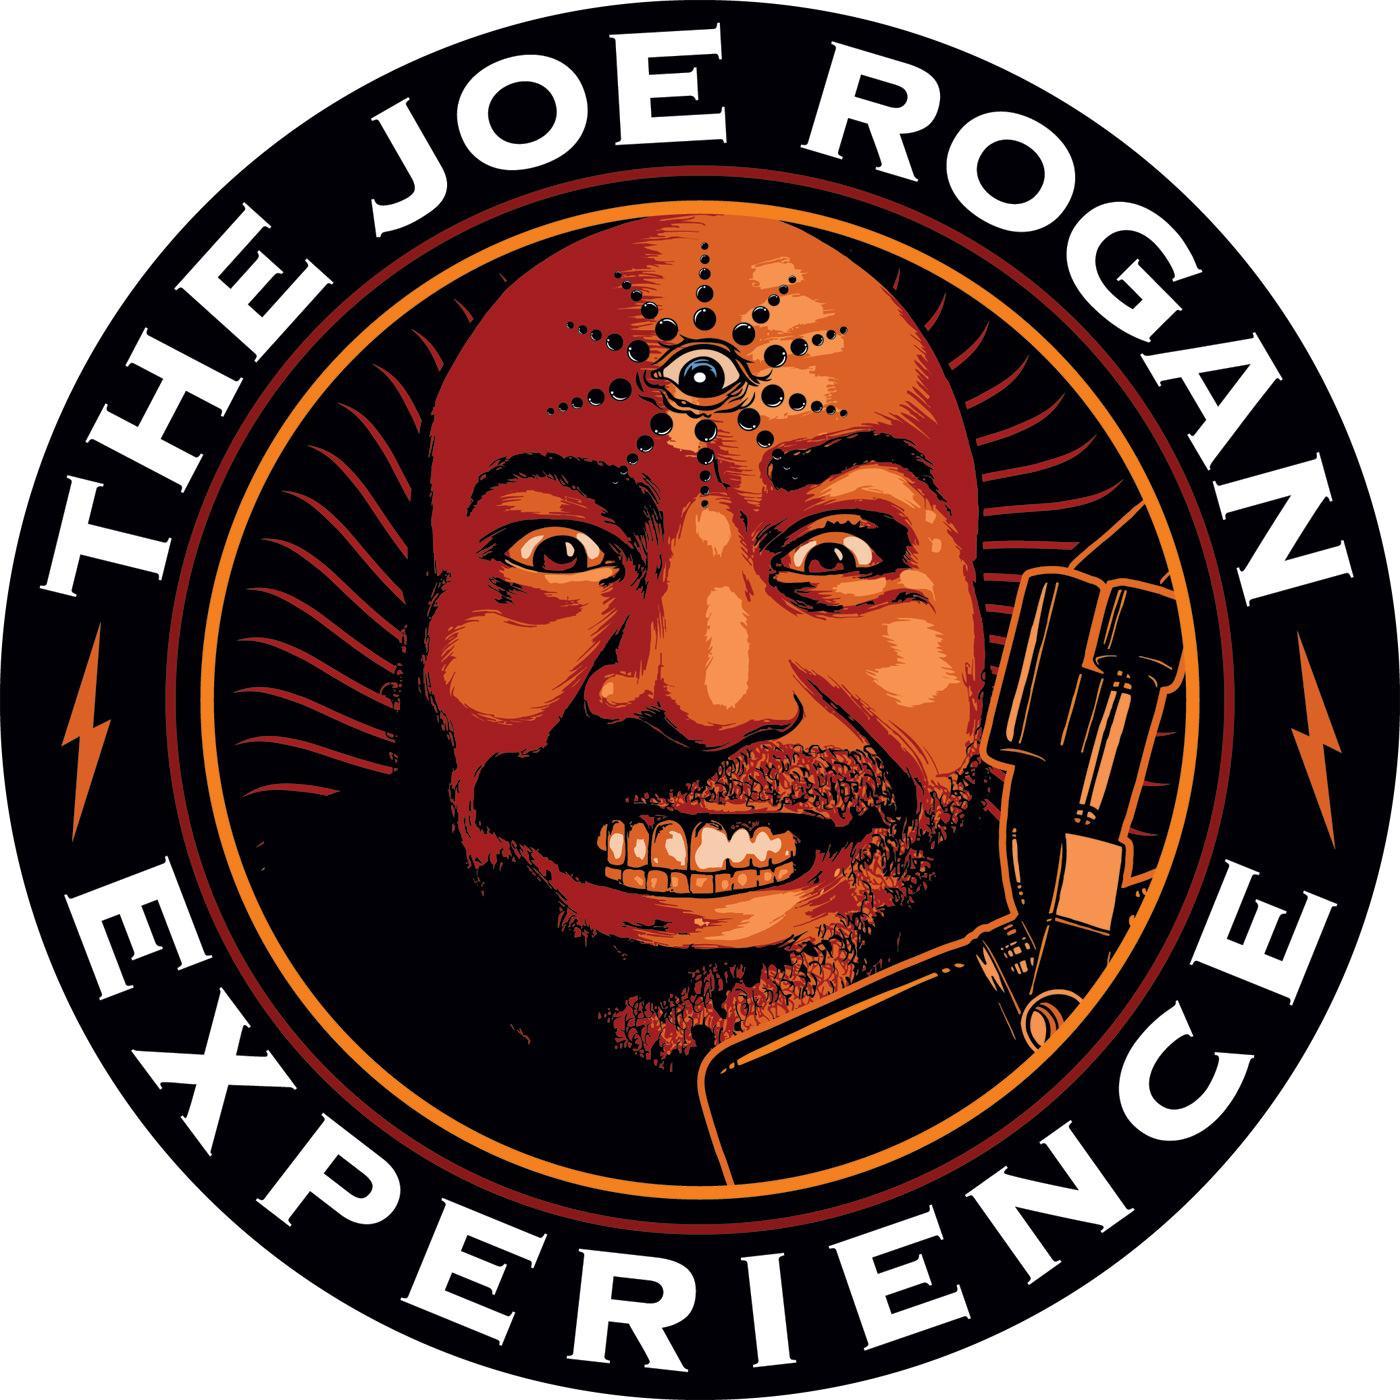 365da660eddb9 #1038 - Billy Corgan - The Joe Rogan Experience (podcast) | Listen Notes